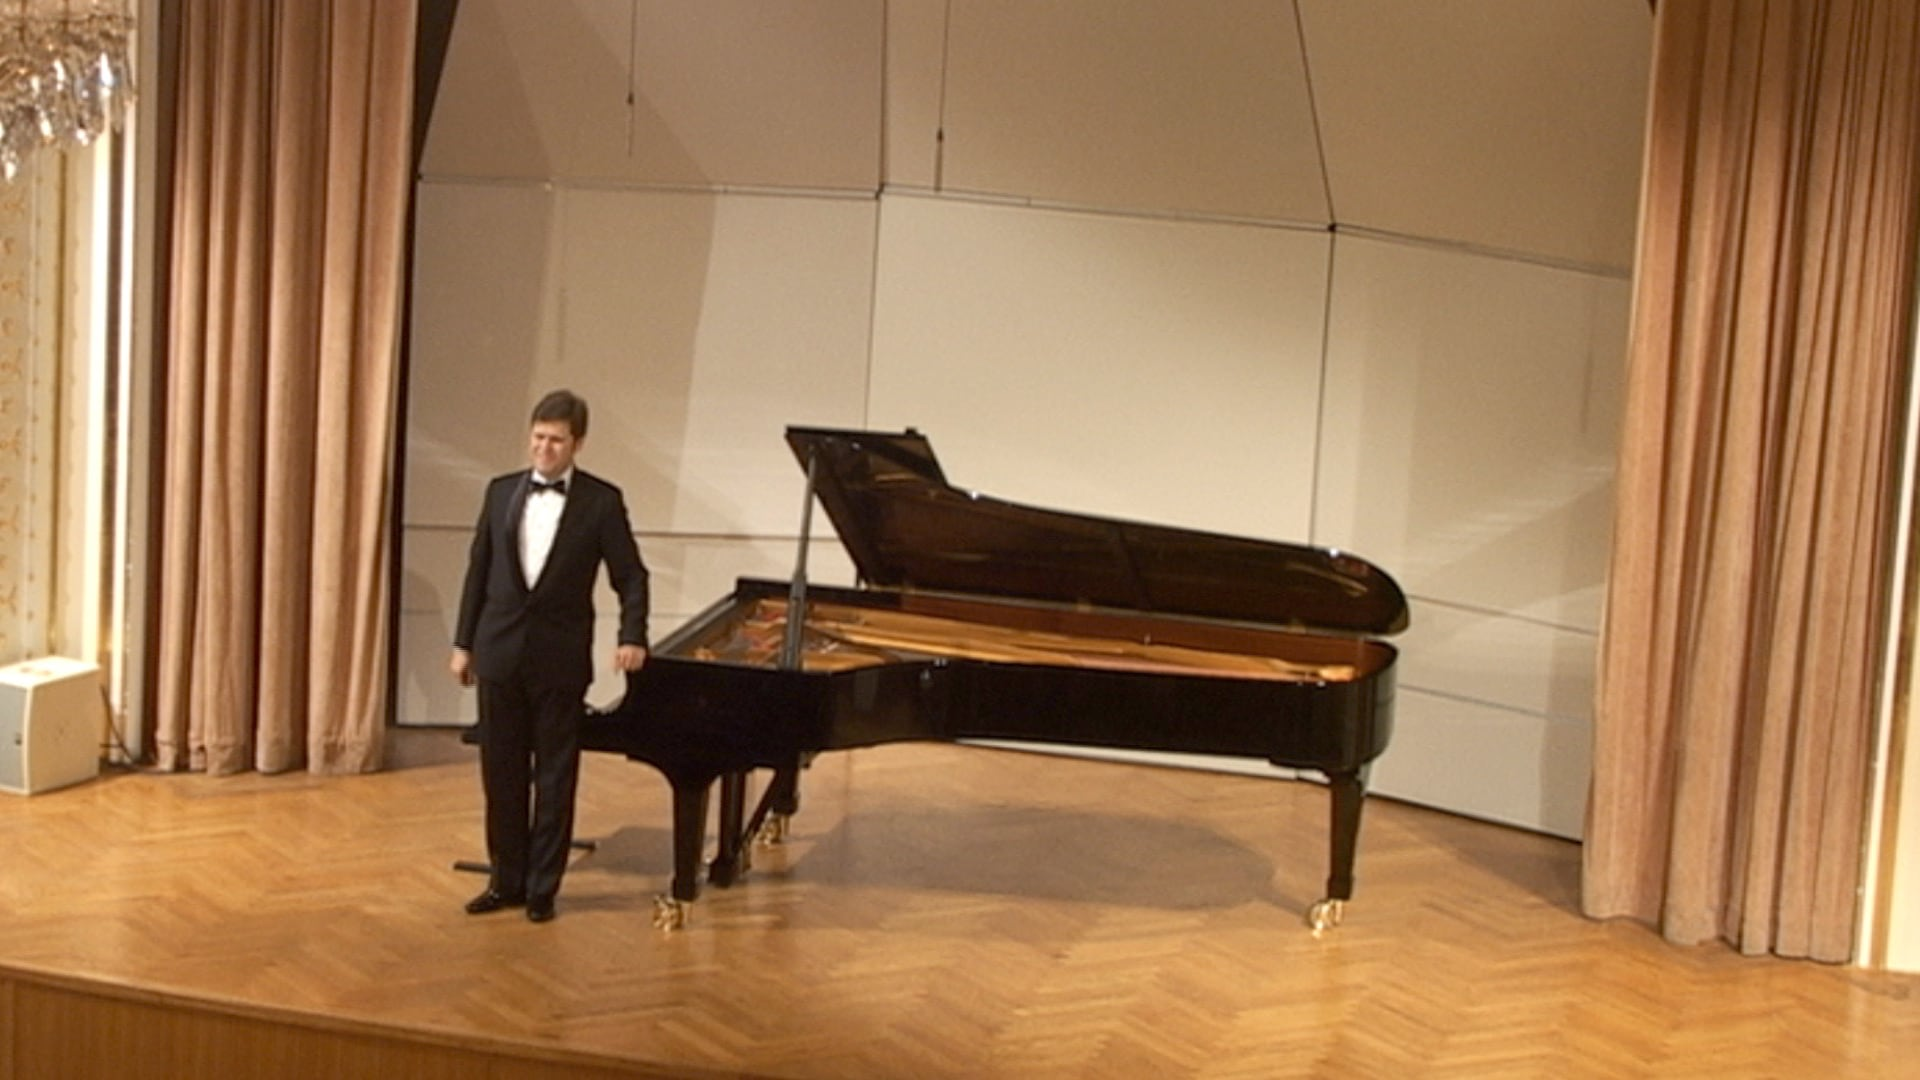 Klavírny recitál VI. – Andrey Yaroshinsky